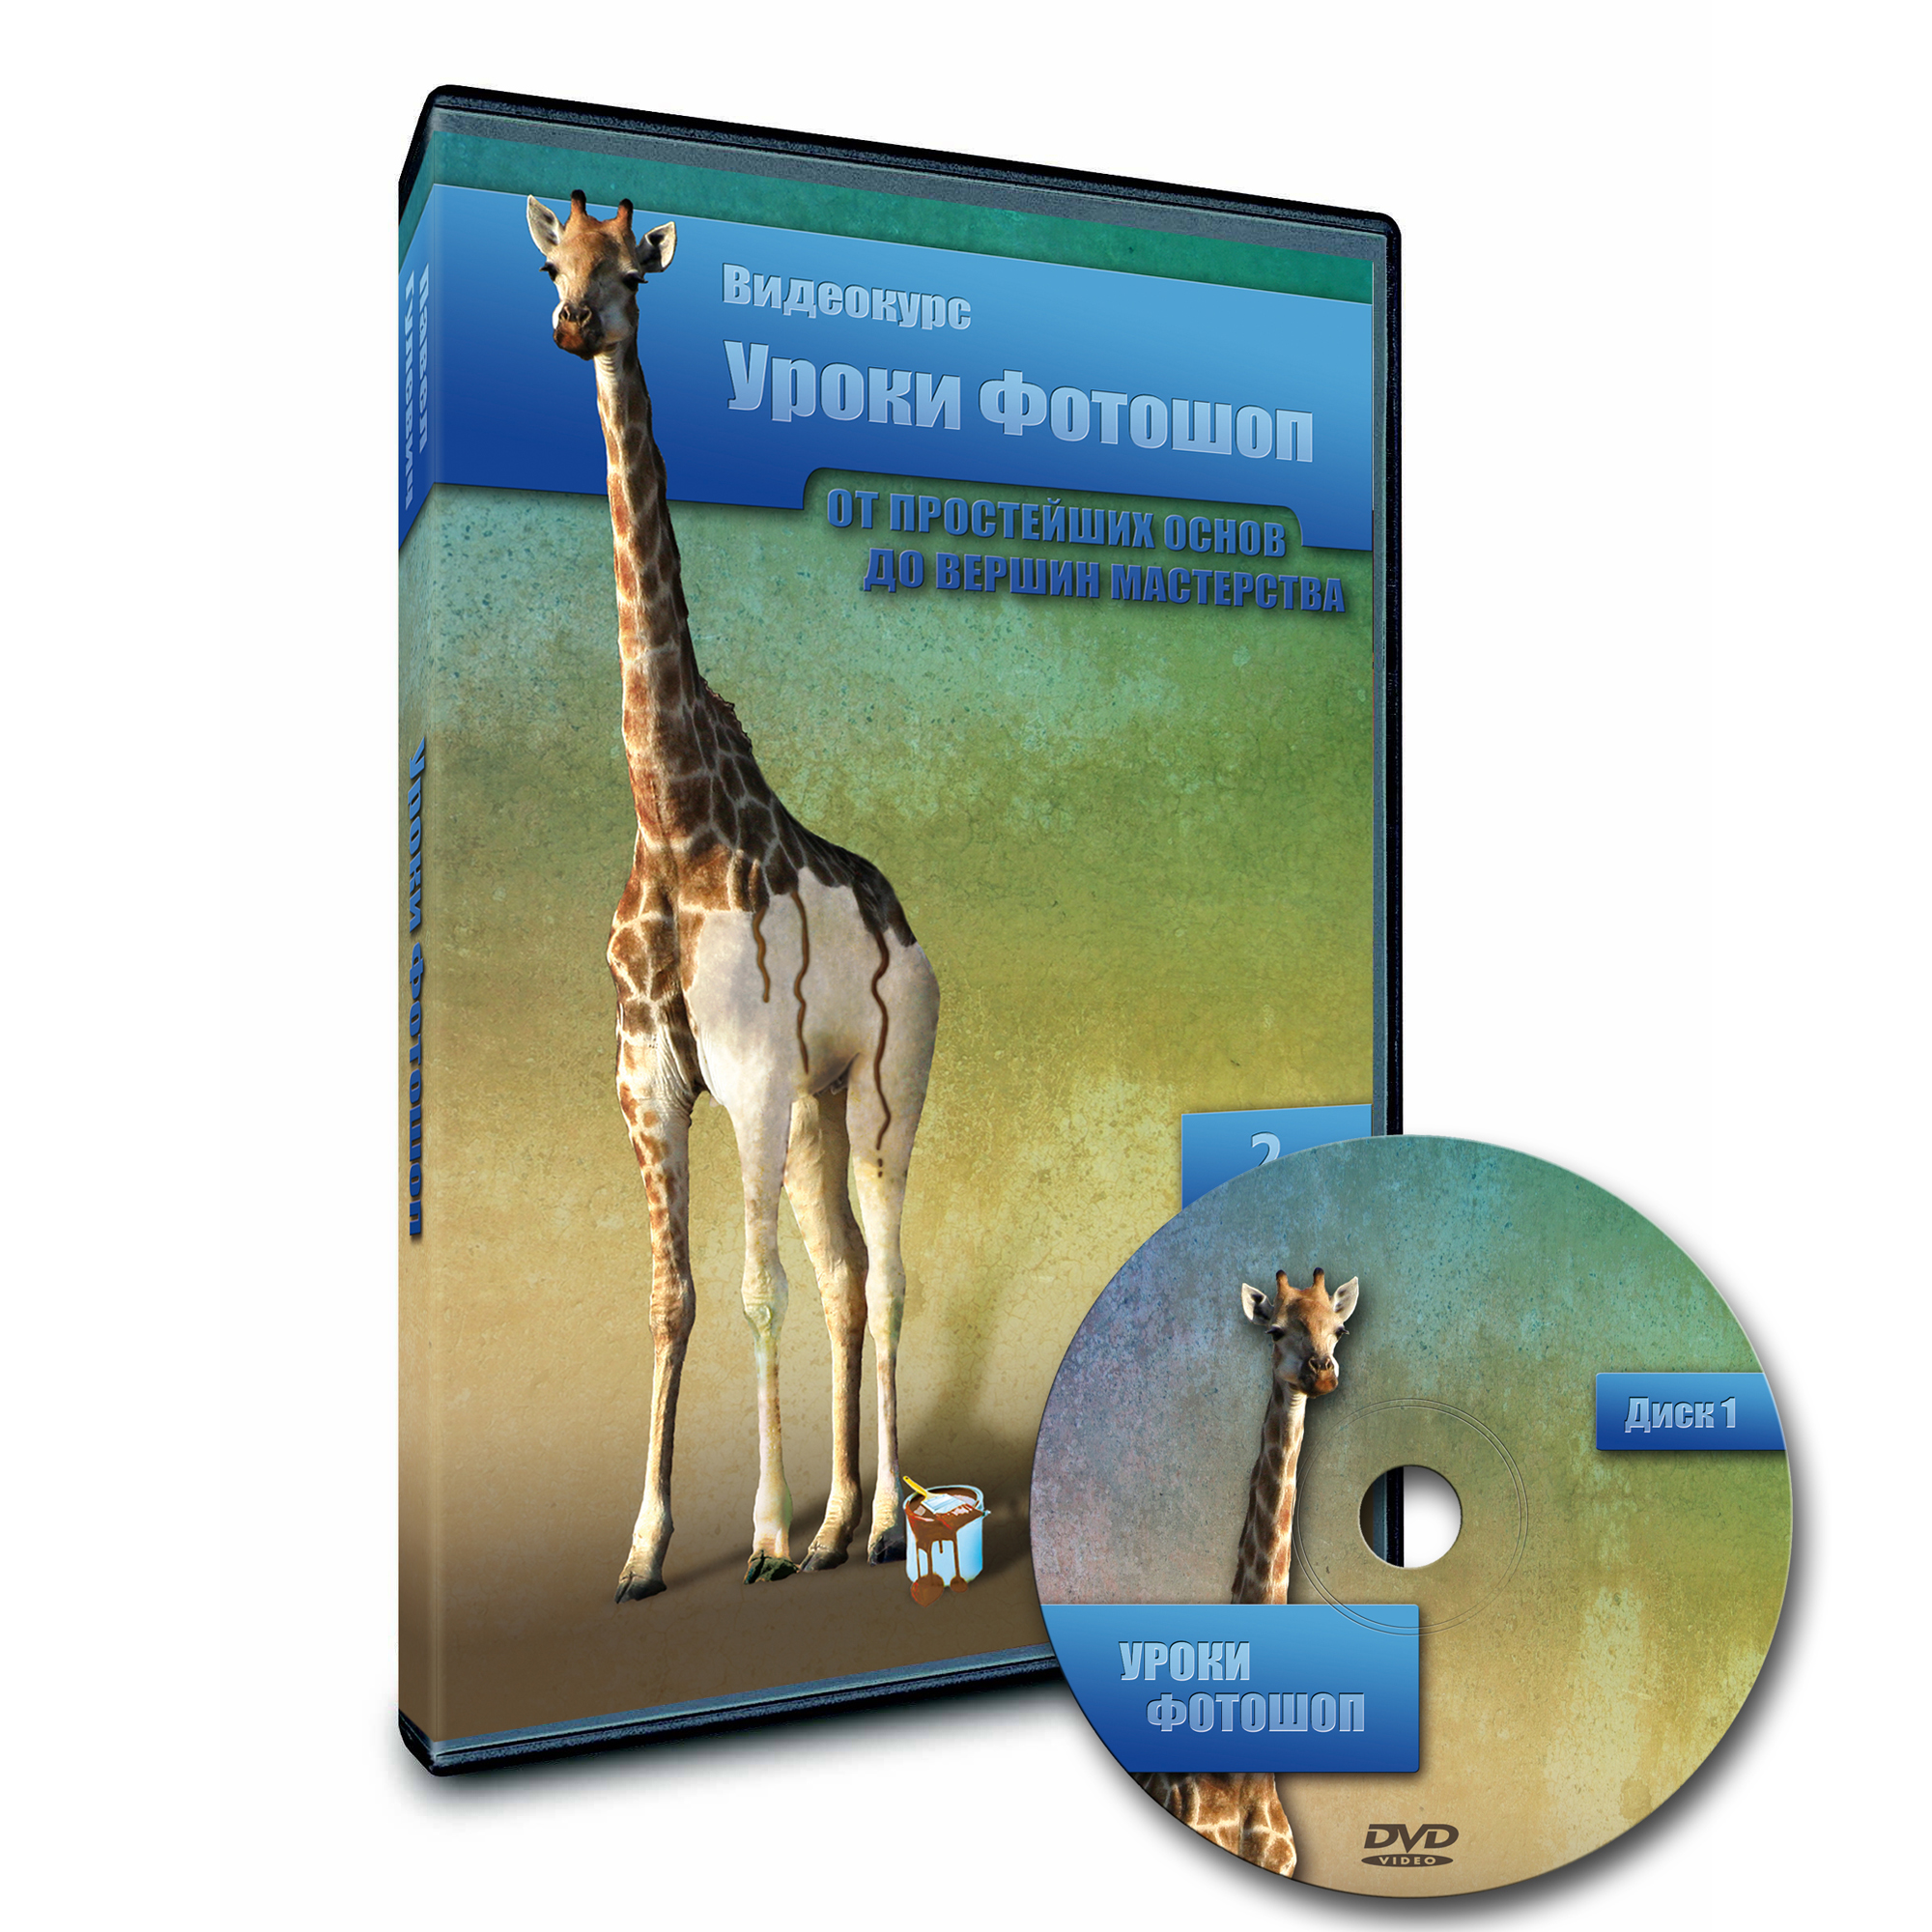 Создание дизайна DVD релиза (обложка, накатка, меню и т.п.) фото f_4d8f92e293655.jpg